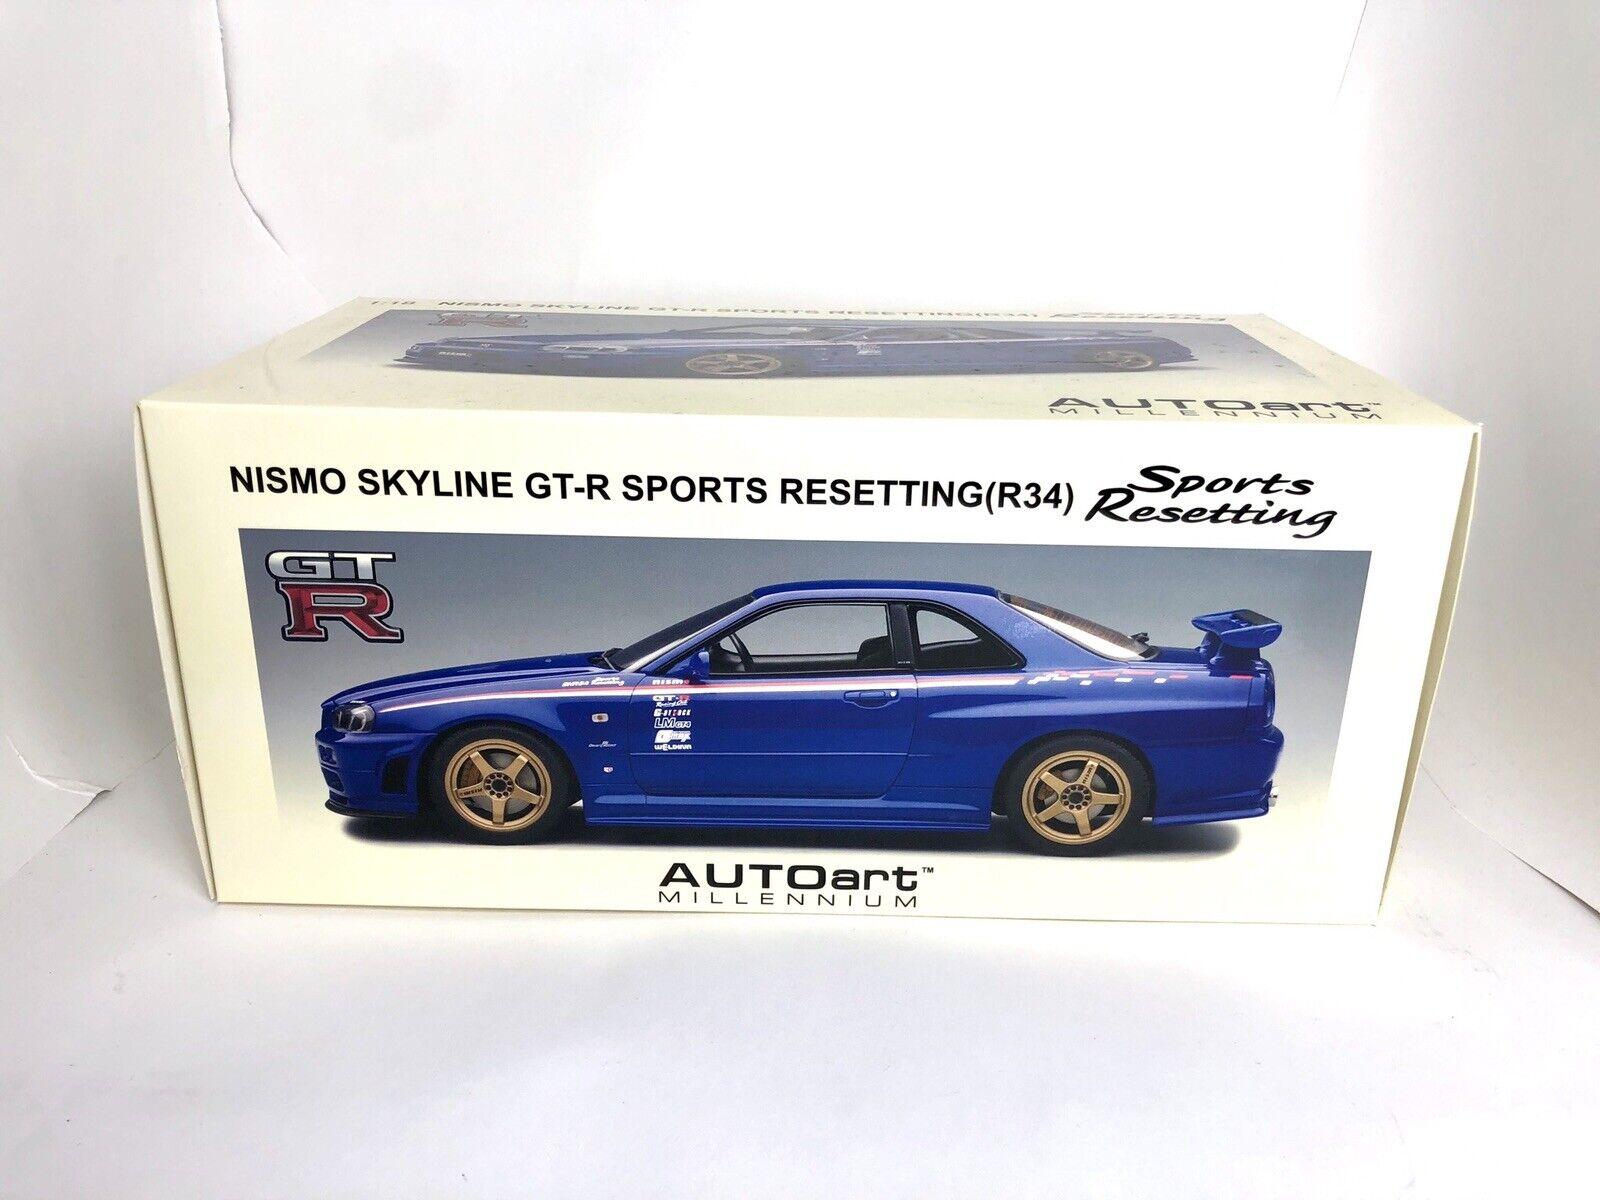 1 18 Nissan Nismo Skyline GT-R Sports Resetting R34 Diecast Model AUTOart 77359